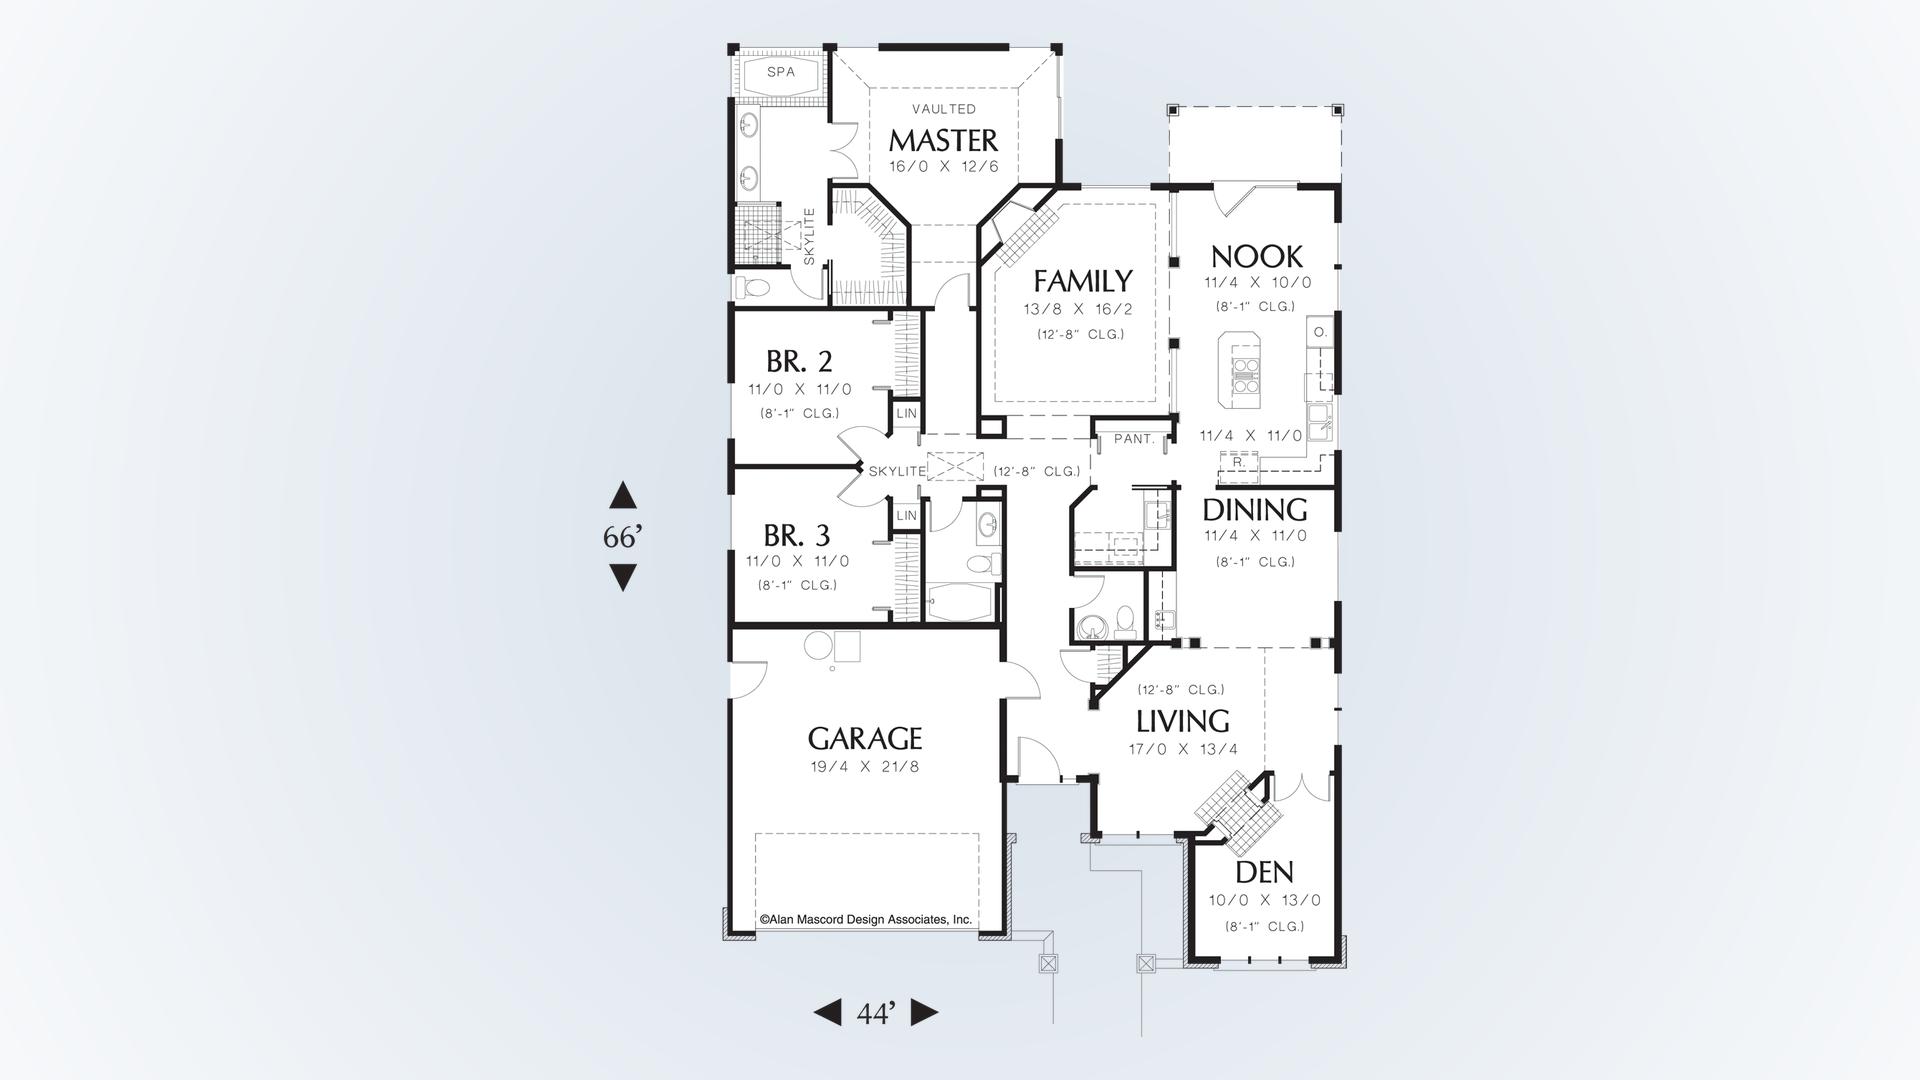 Mascord House Plan 1212 - The Sutherland